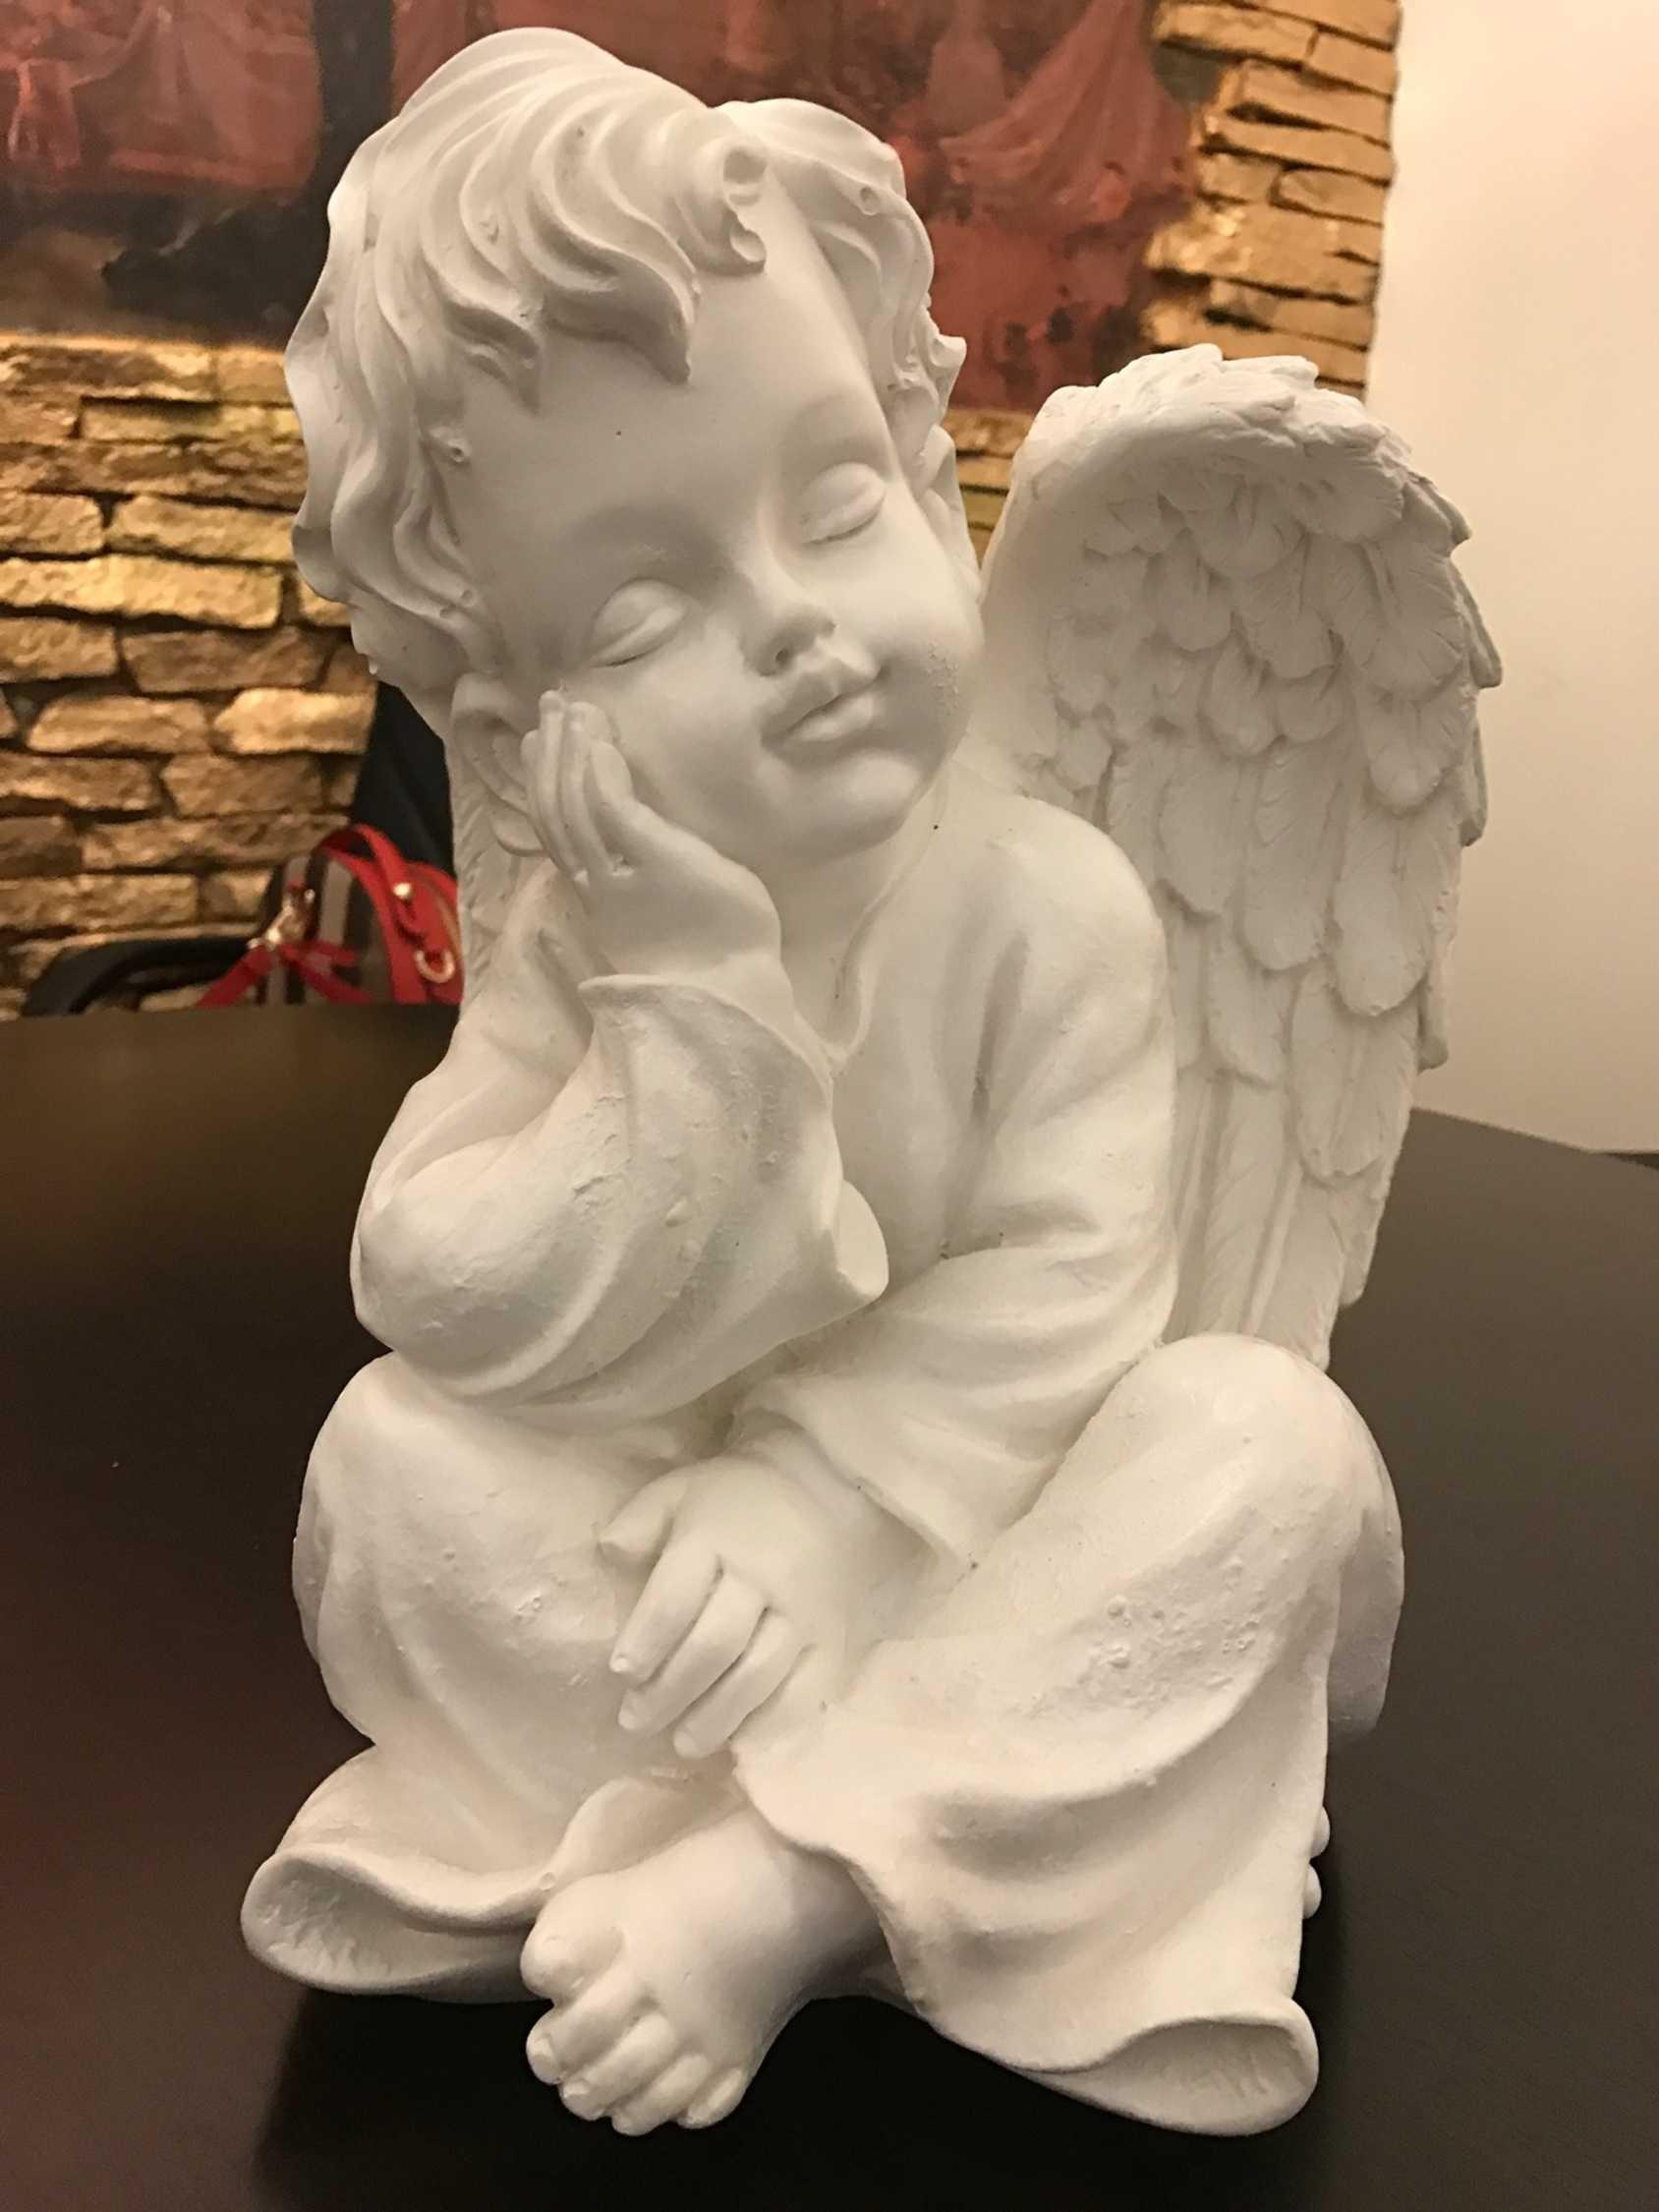 Ангел своими руками Мастер класс - Журнал Сделай сам 26